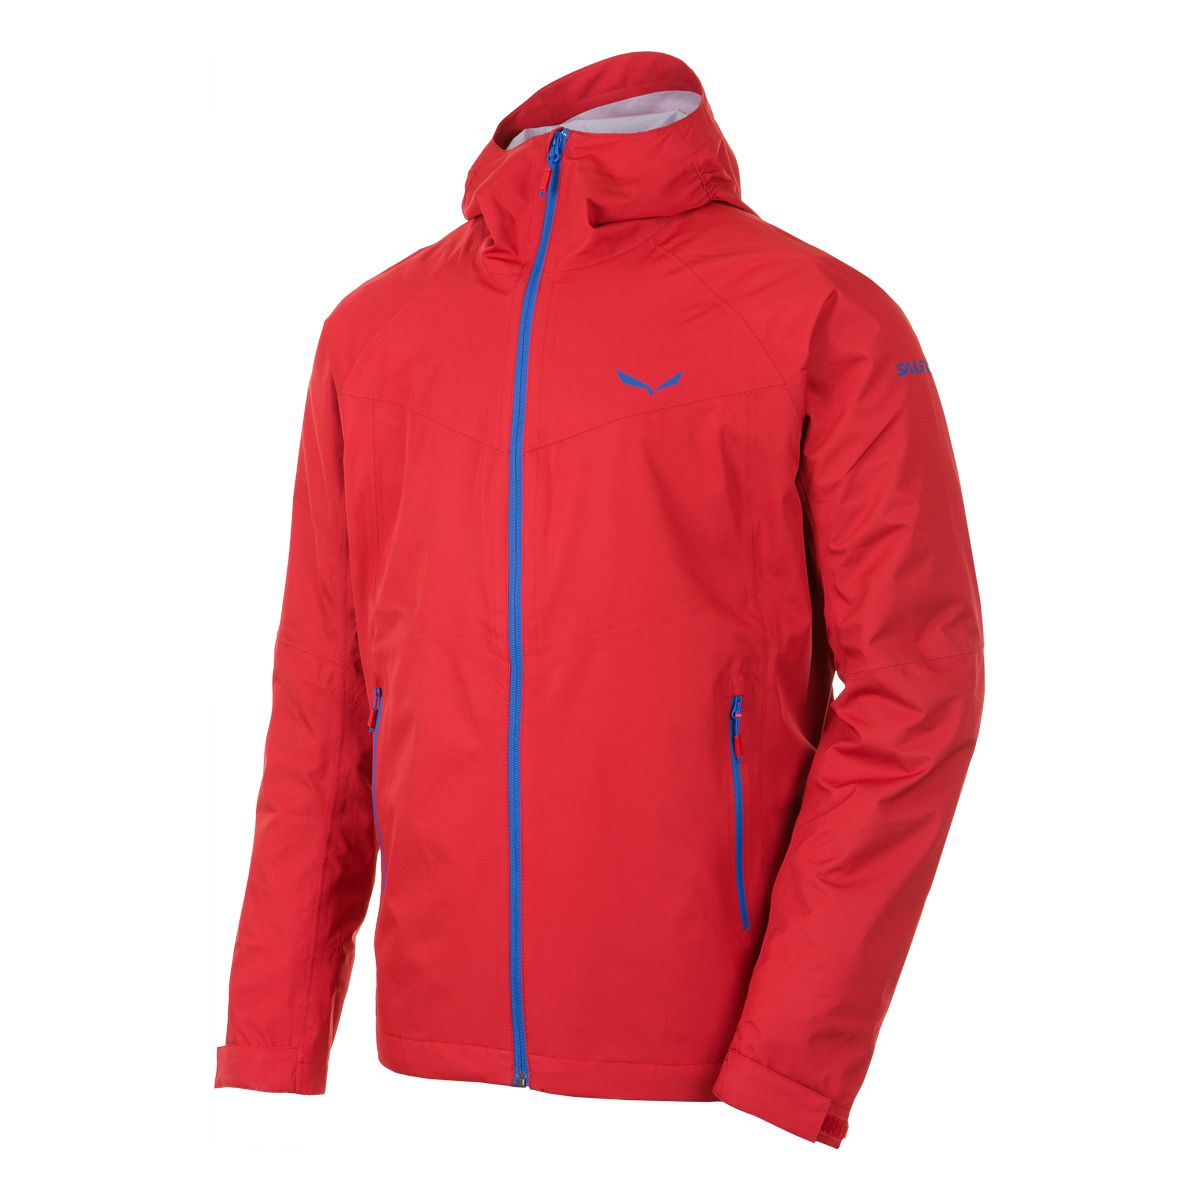 Куртка для активного отдыха Salewa 2016 PUEZ (AQUA 3) PTX M JKT bergrot/8310